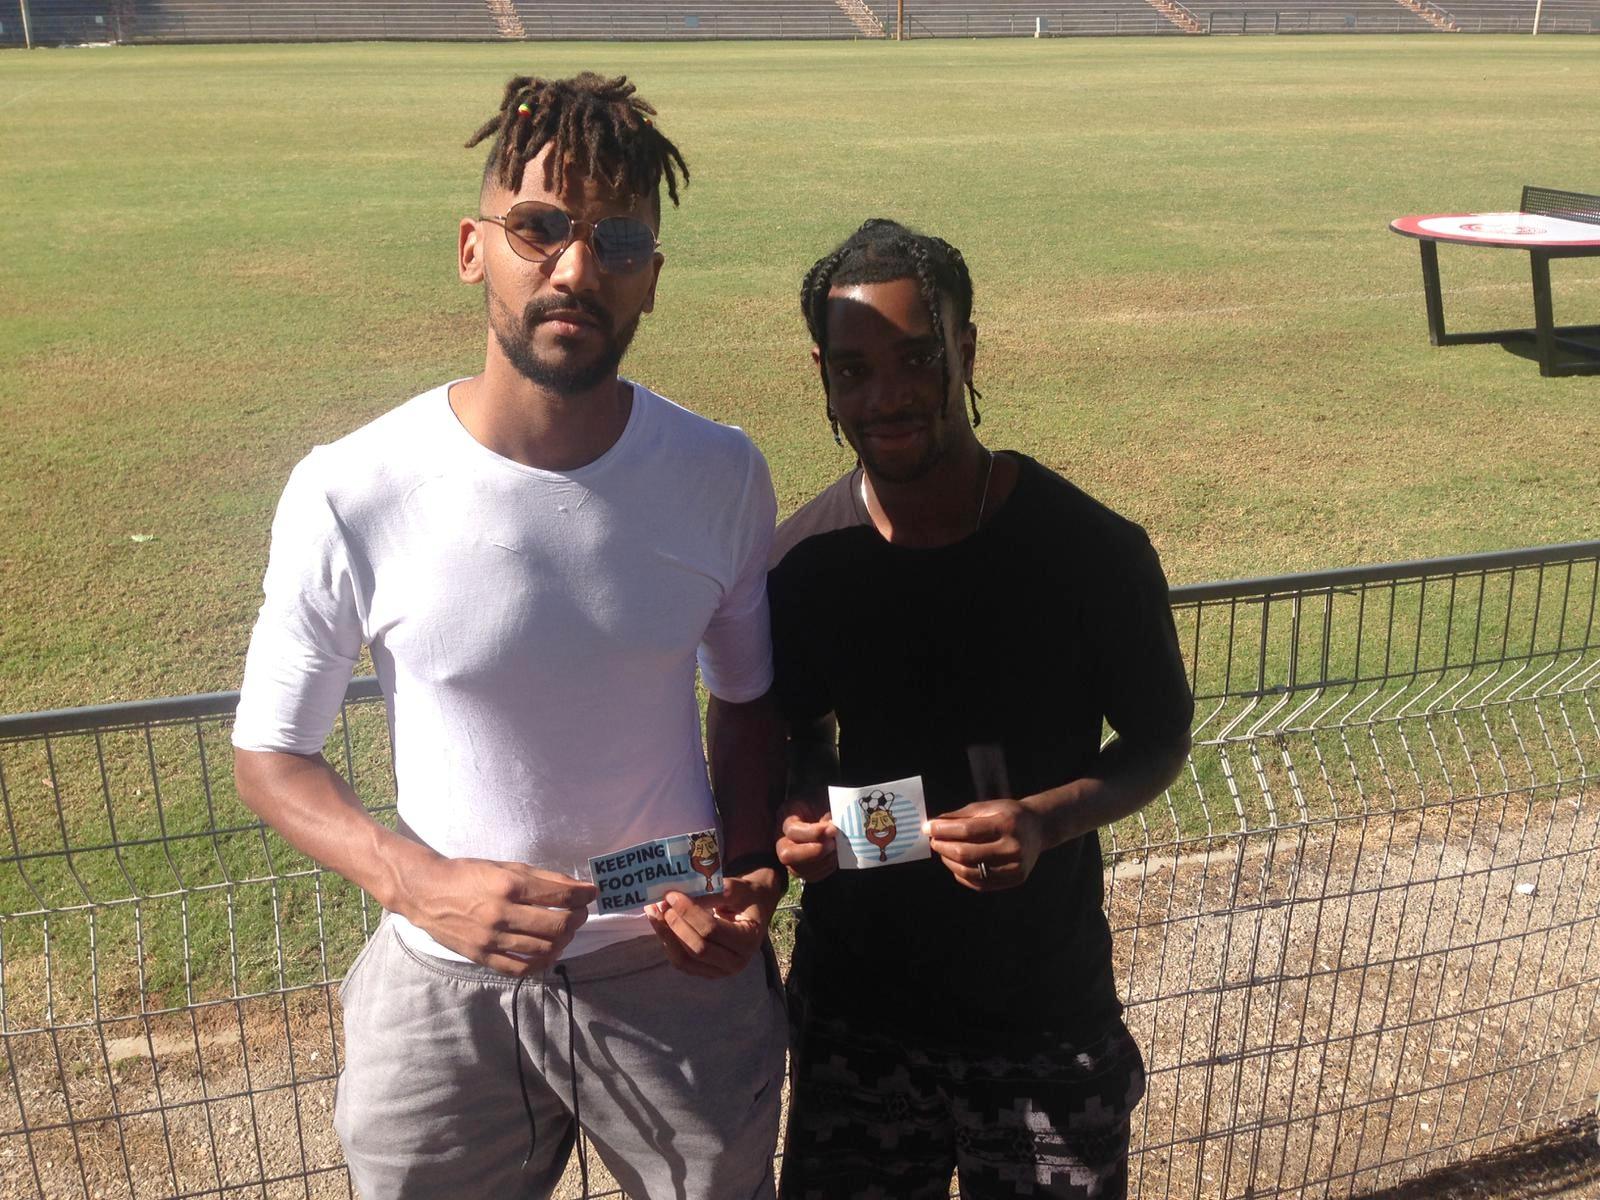 Tapoko and Plumain are keeping football real (Omri Tancman)